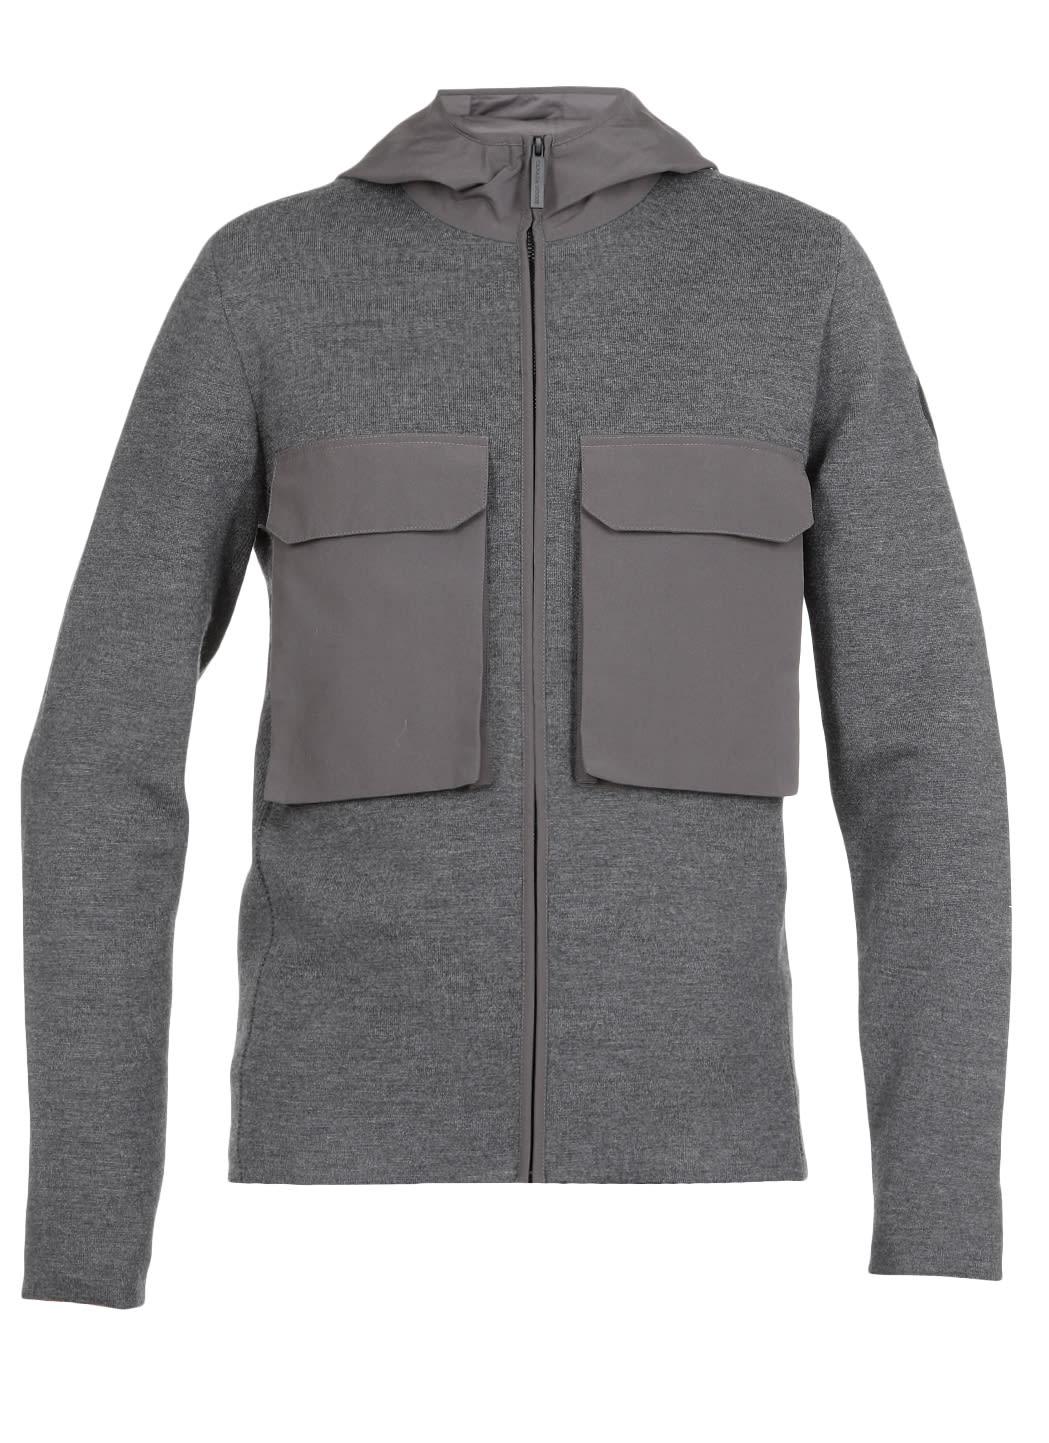 Canada Goose Elgin Wool Sweatshirt